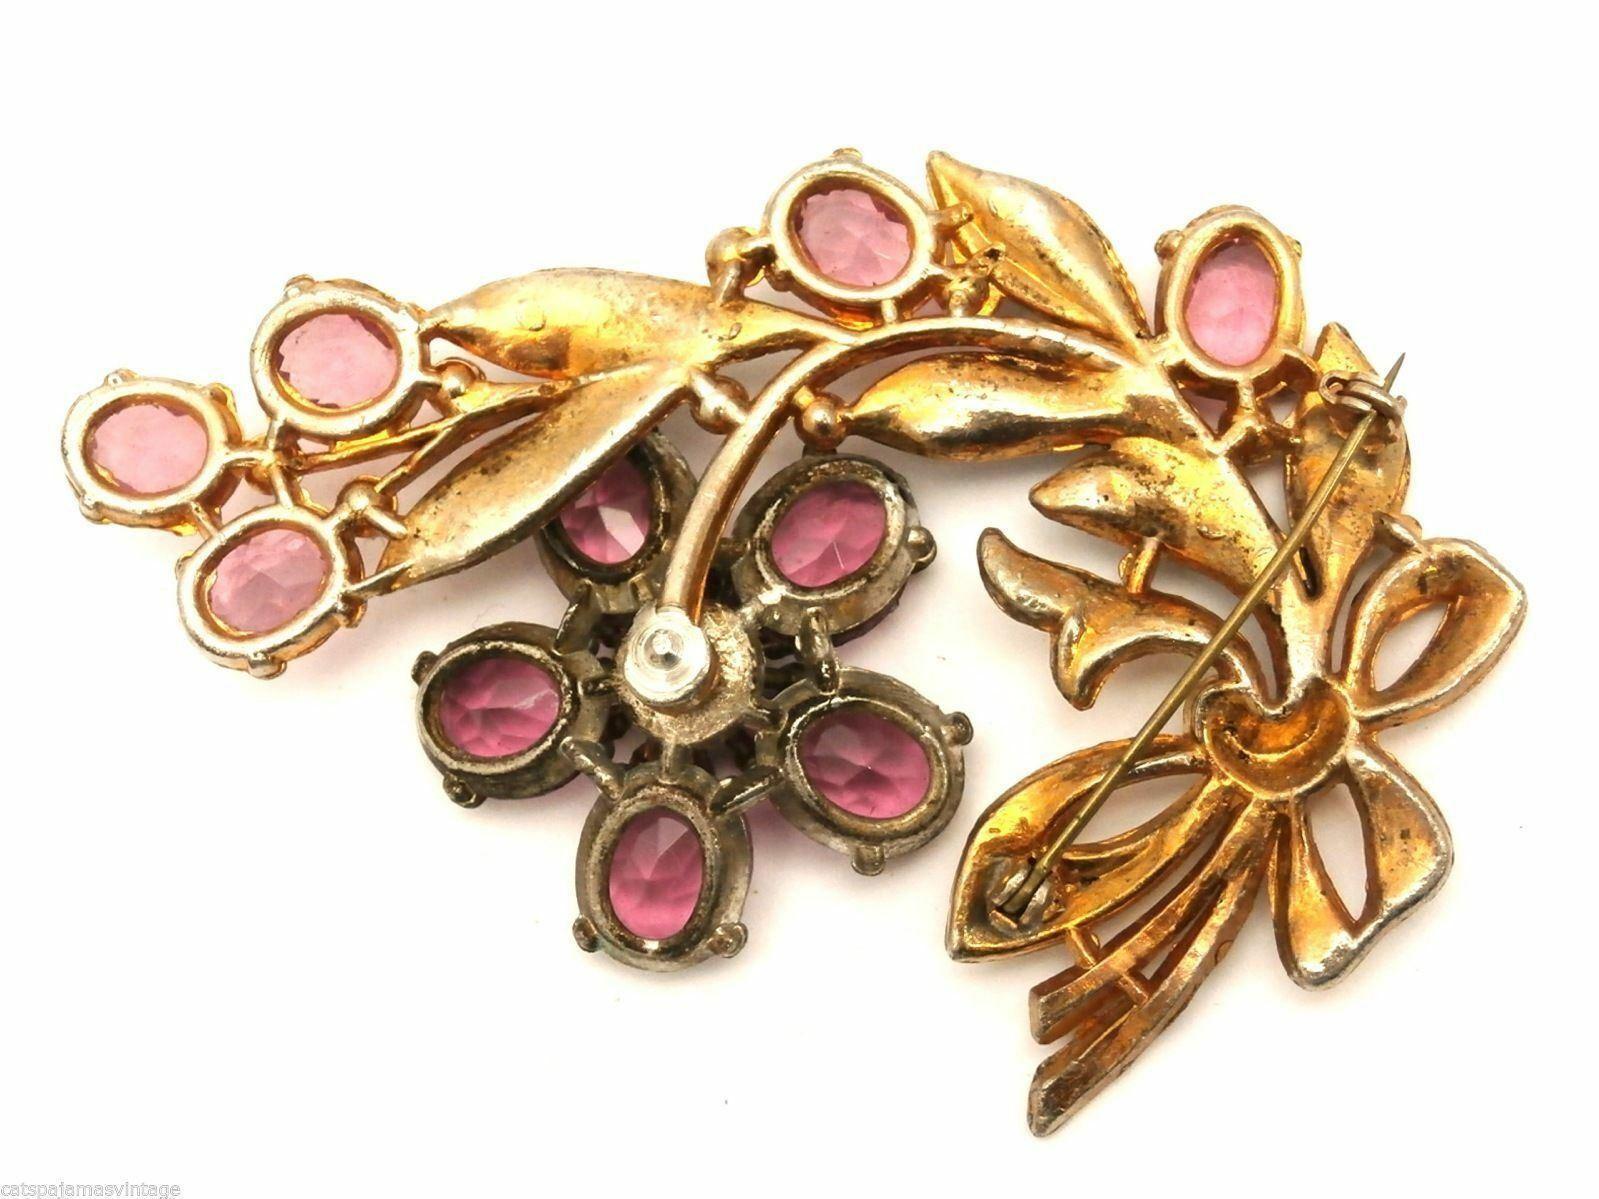 Vintage Brooch 1940s Paste  Large Pink Stones Enamel